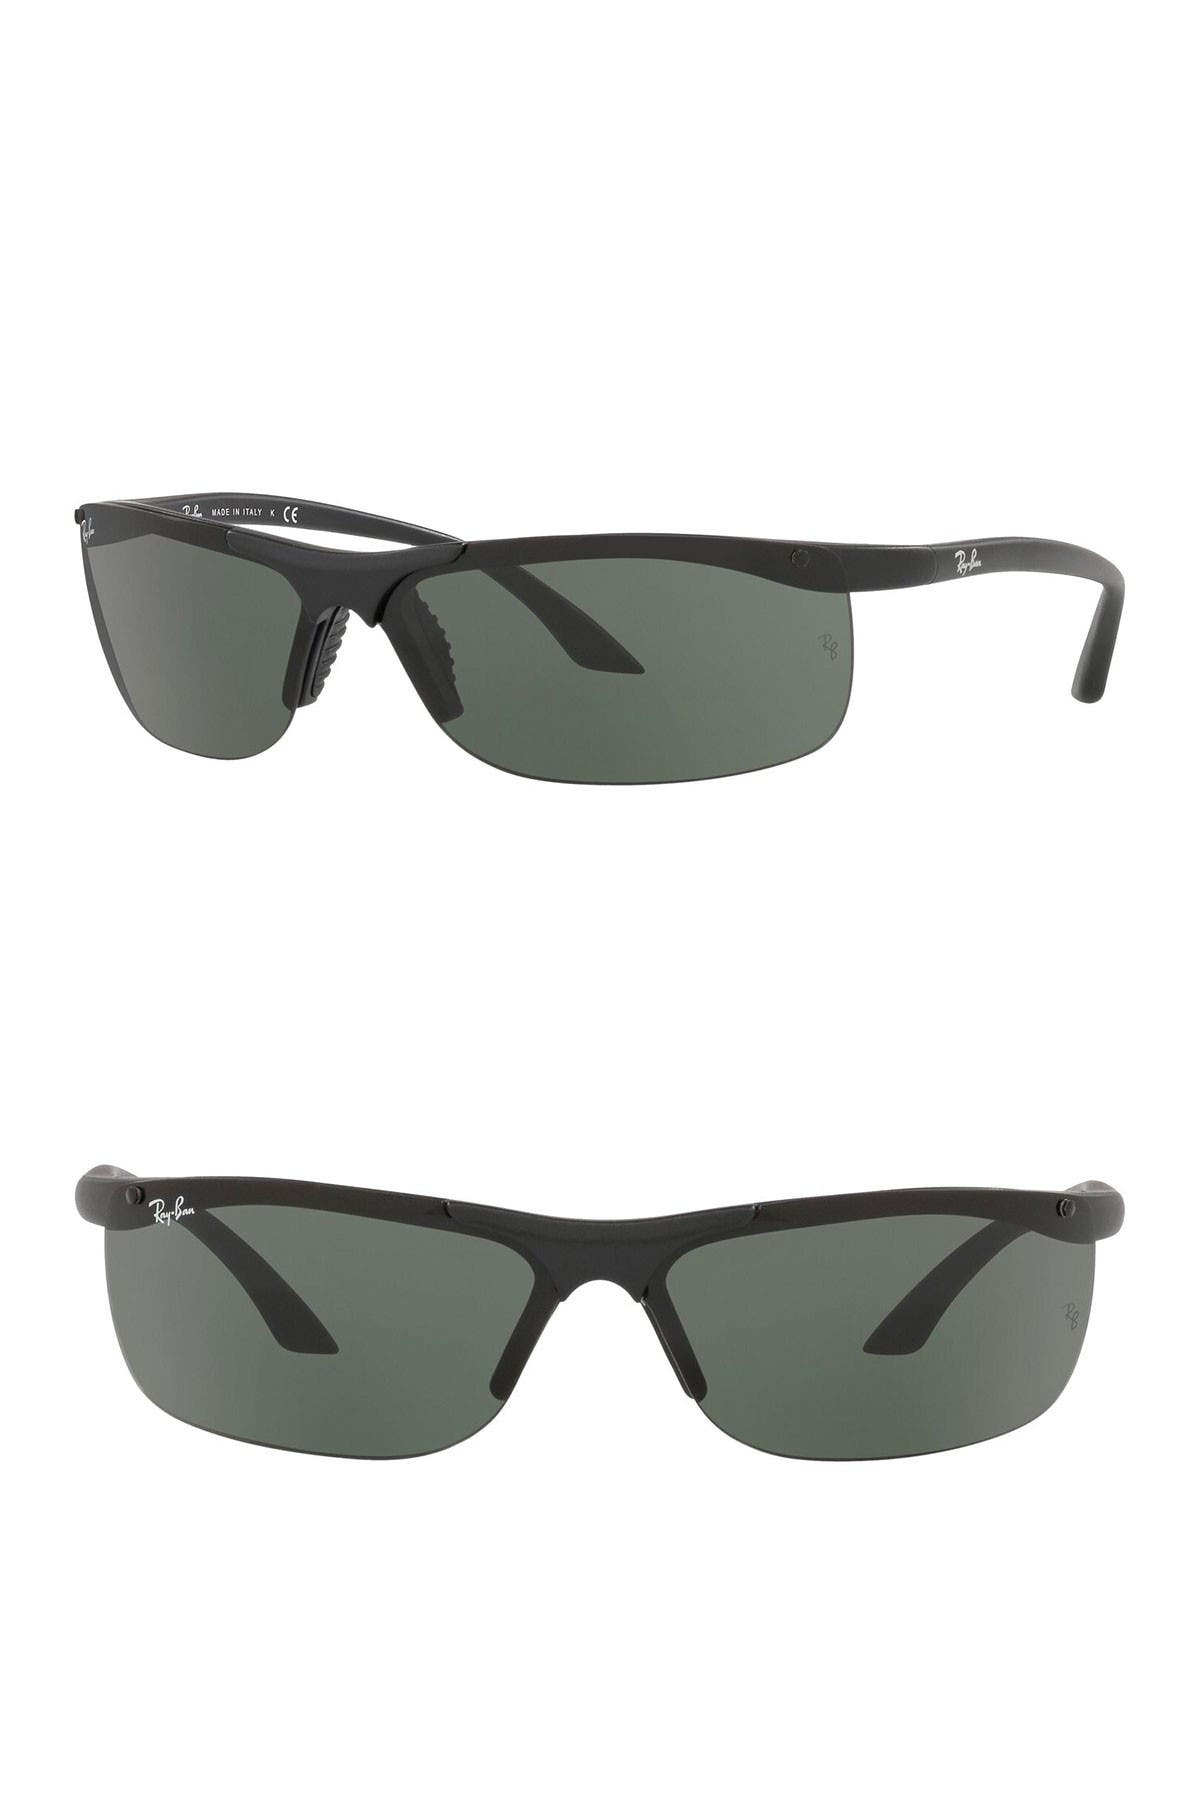 Image of Ray-Ban 68mm Rectangular Sunglasses